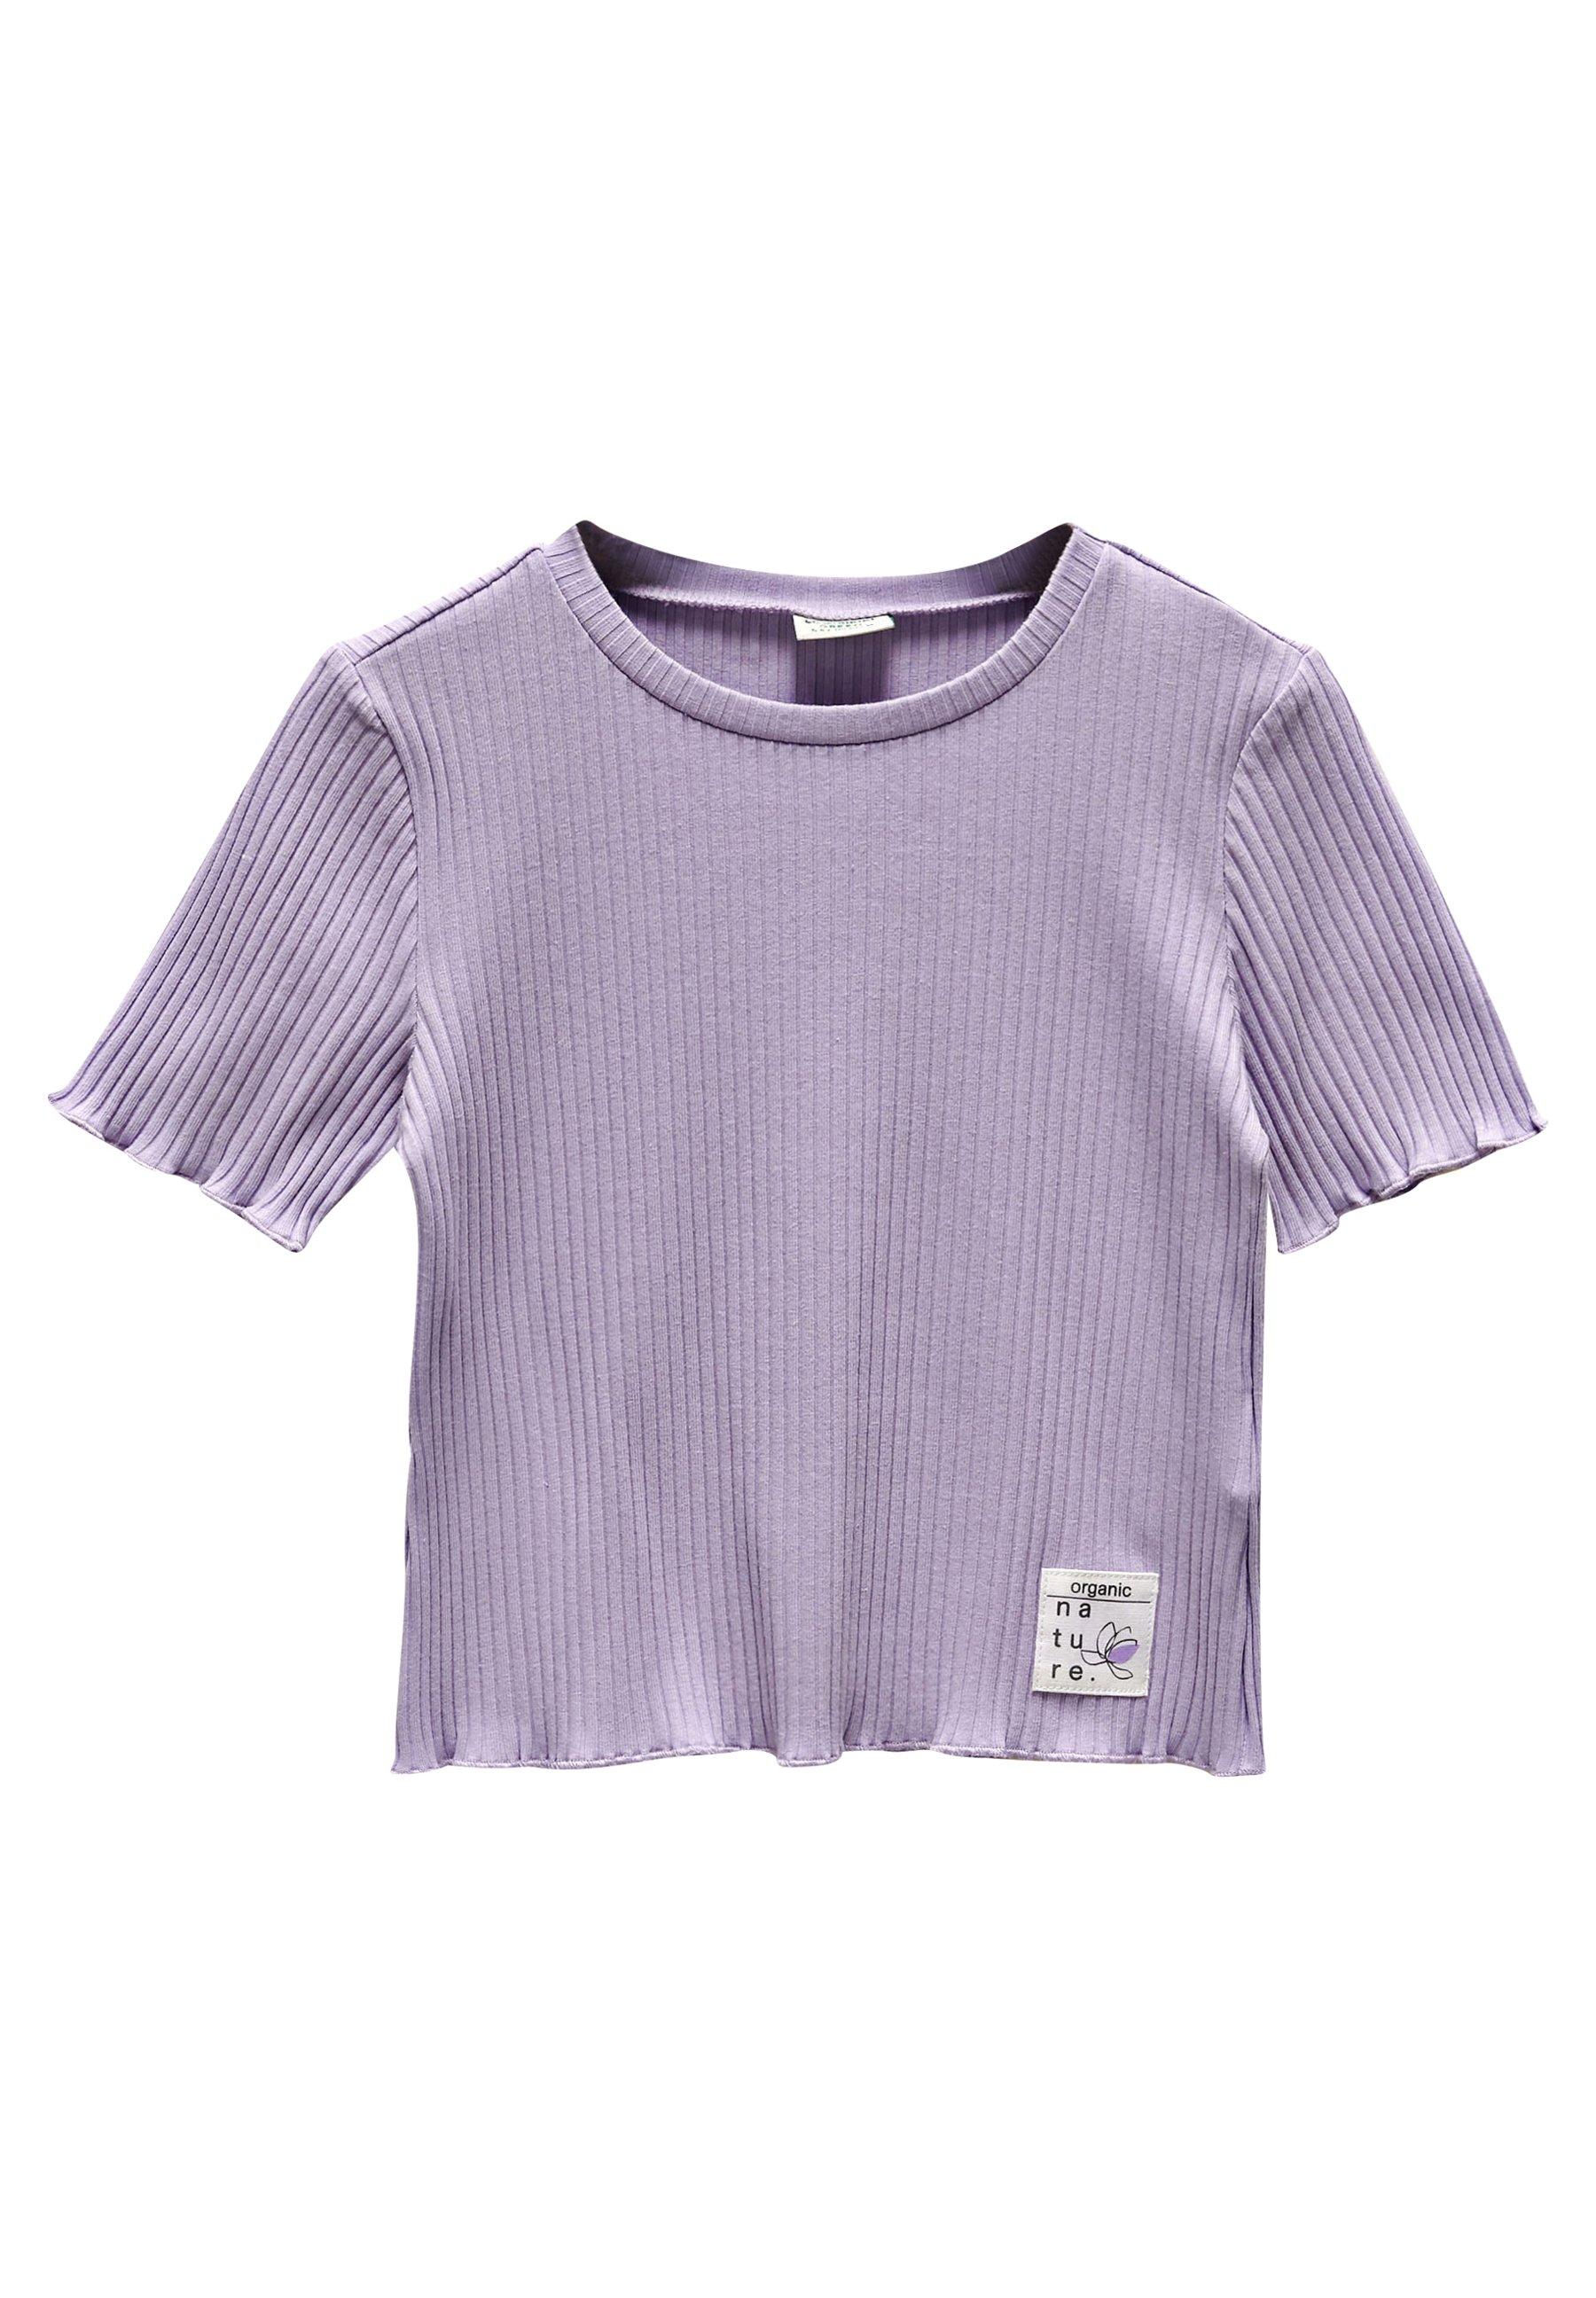 Bambini T-shirt basic